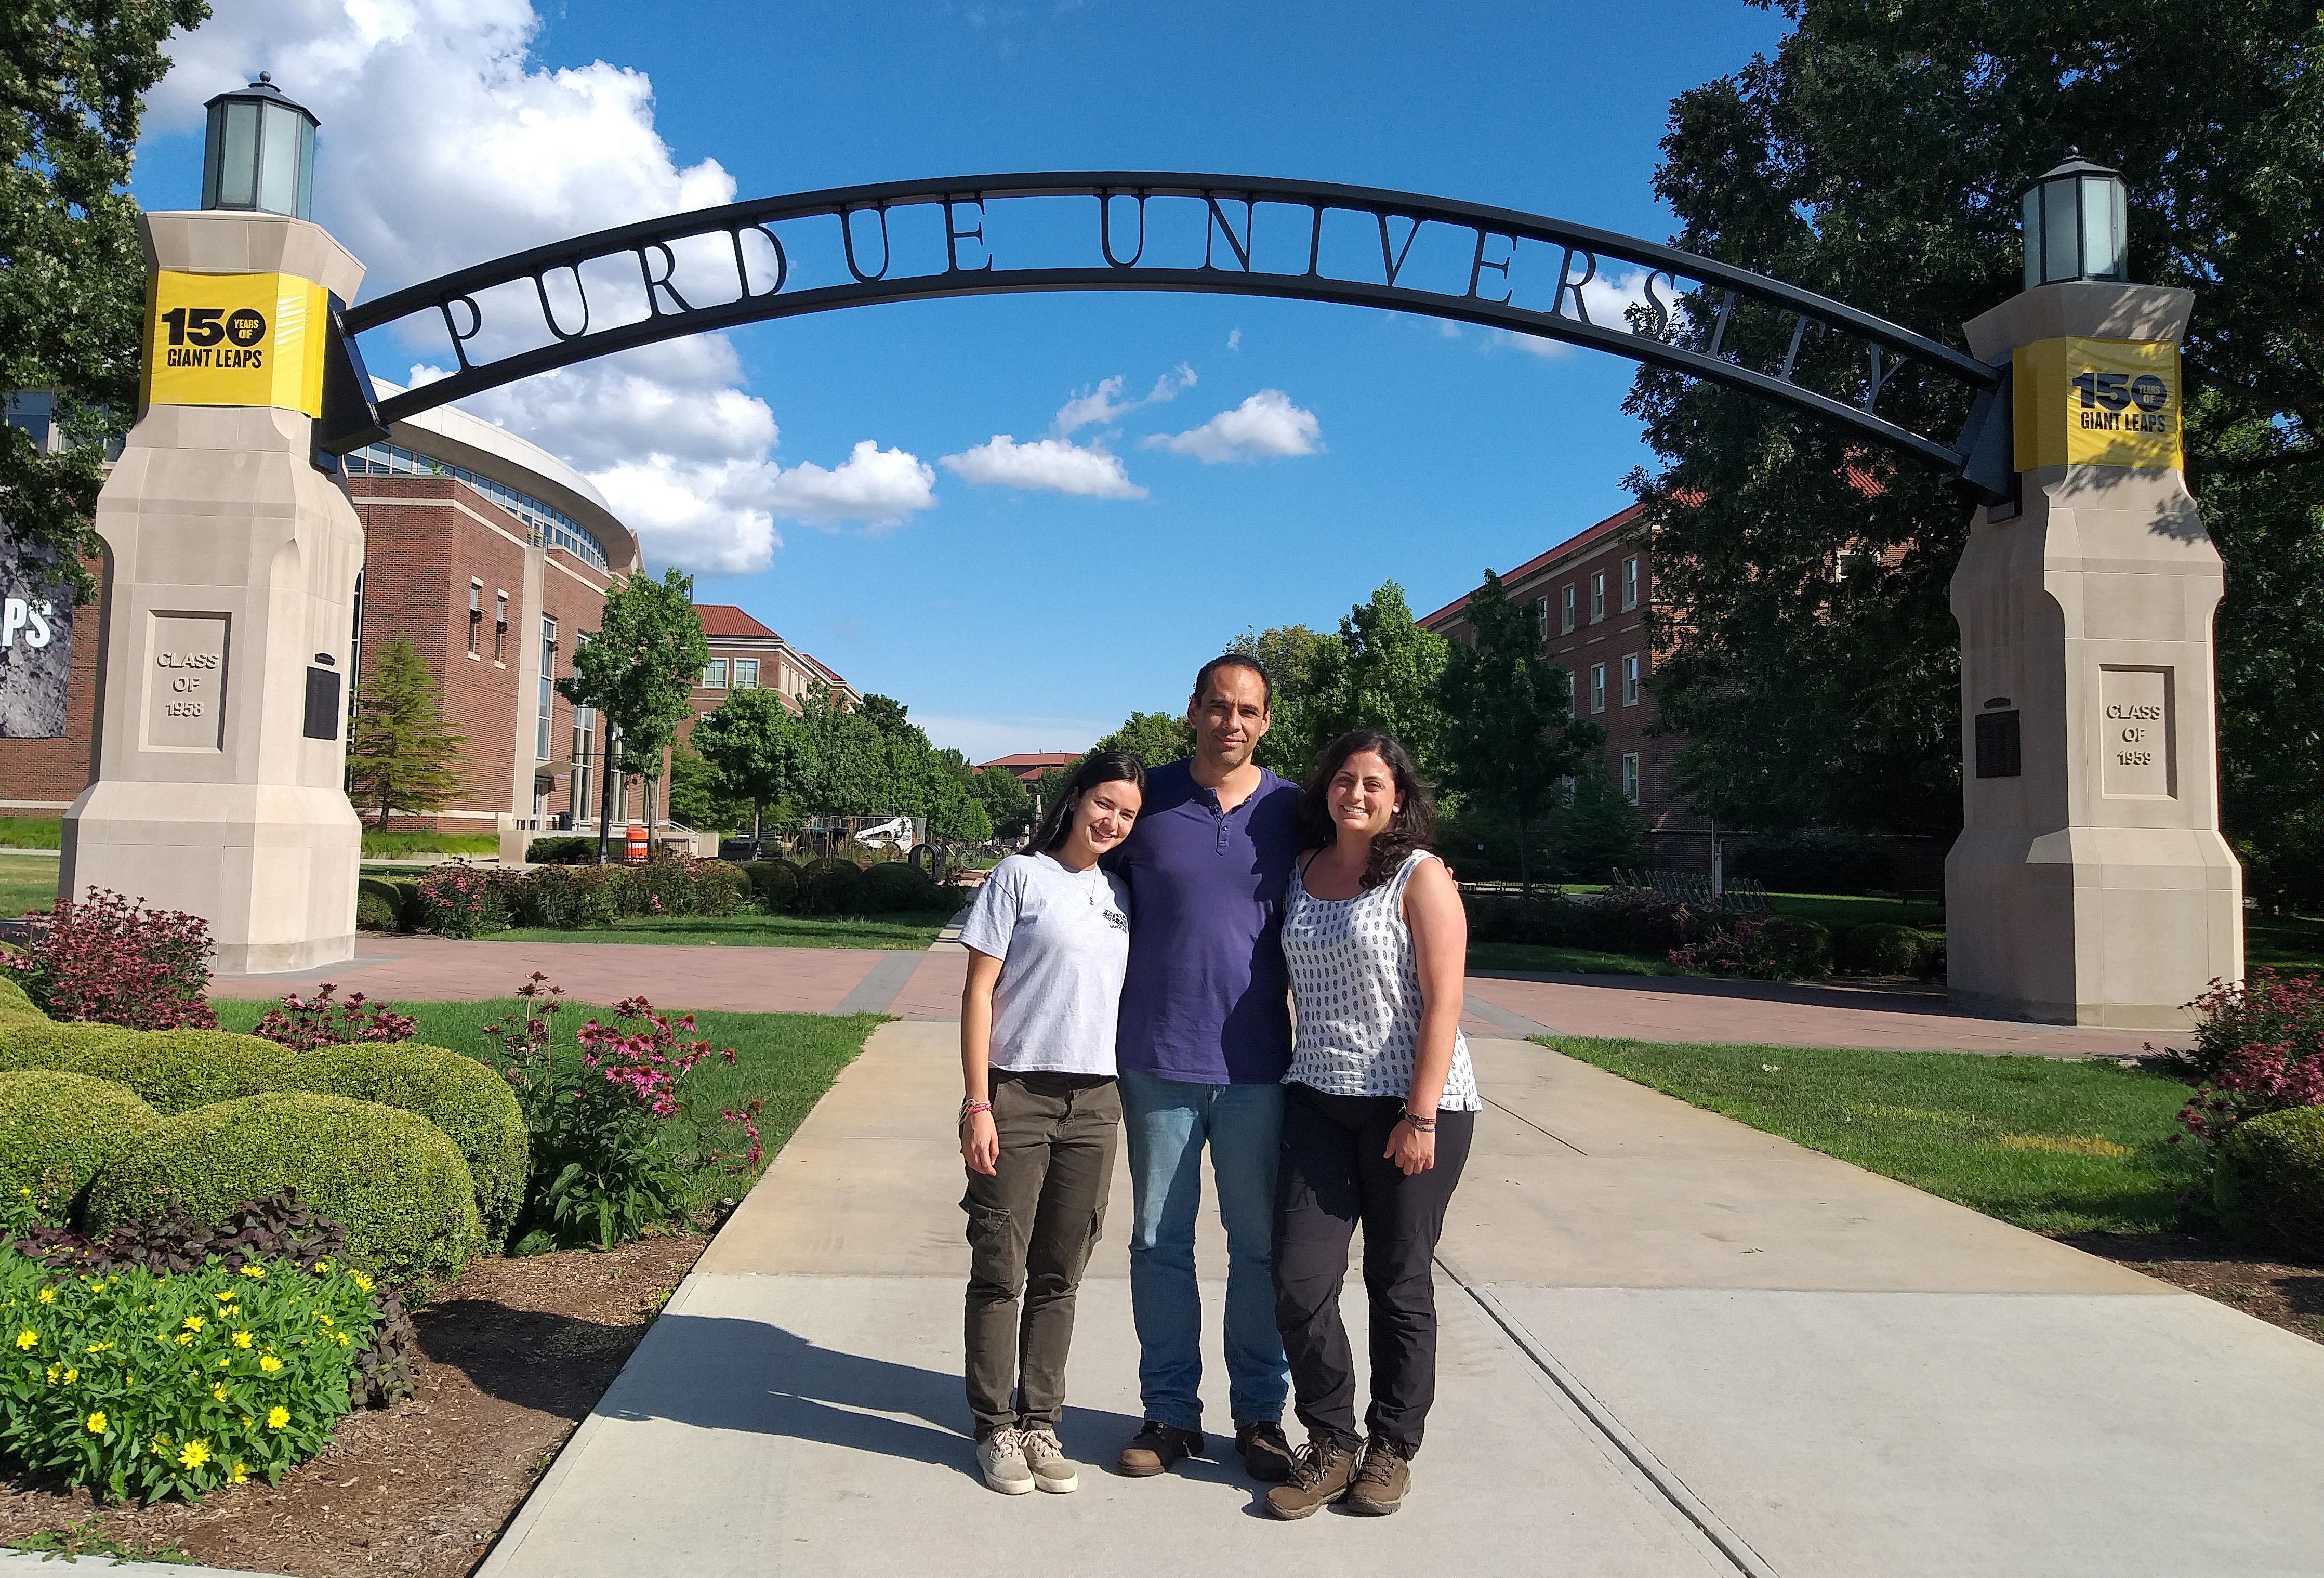 2019 Purdue University, Indiana, USA